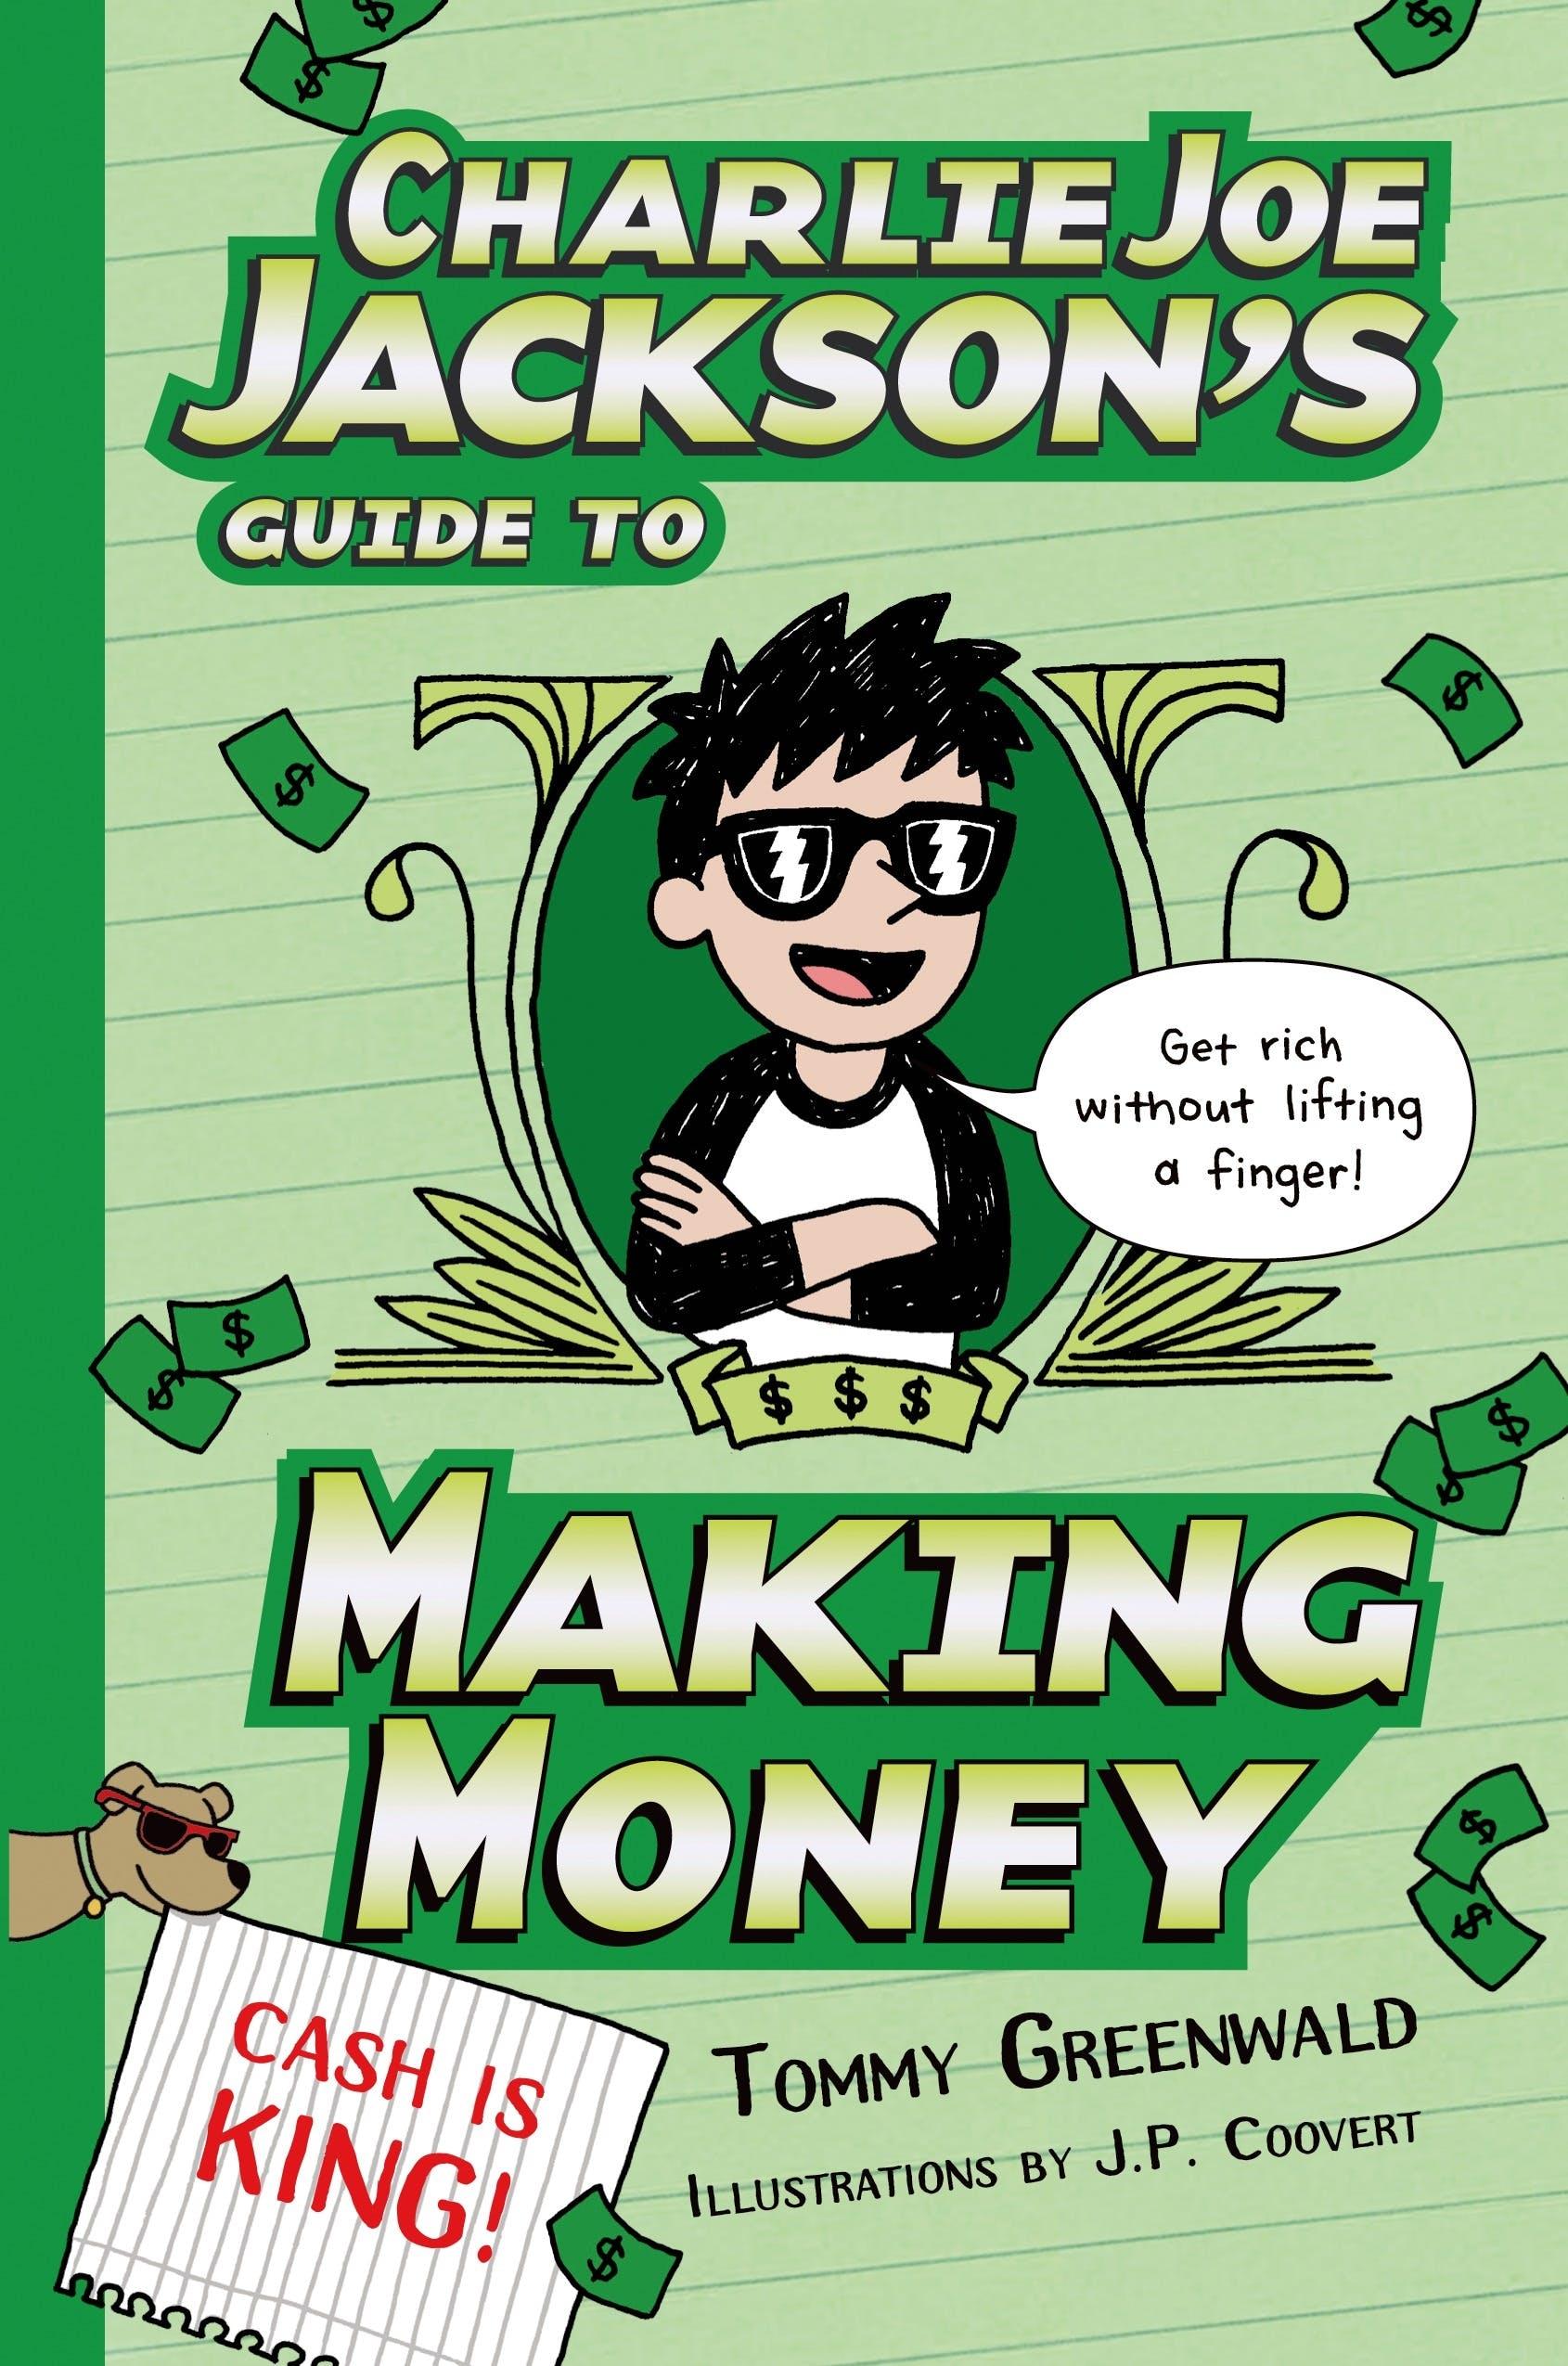 Image of Charlie Joe Jackson's Guide to Making Money